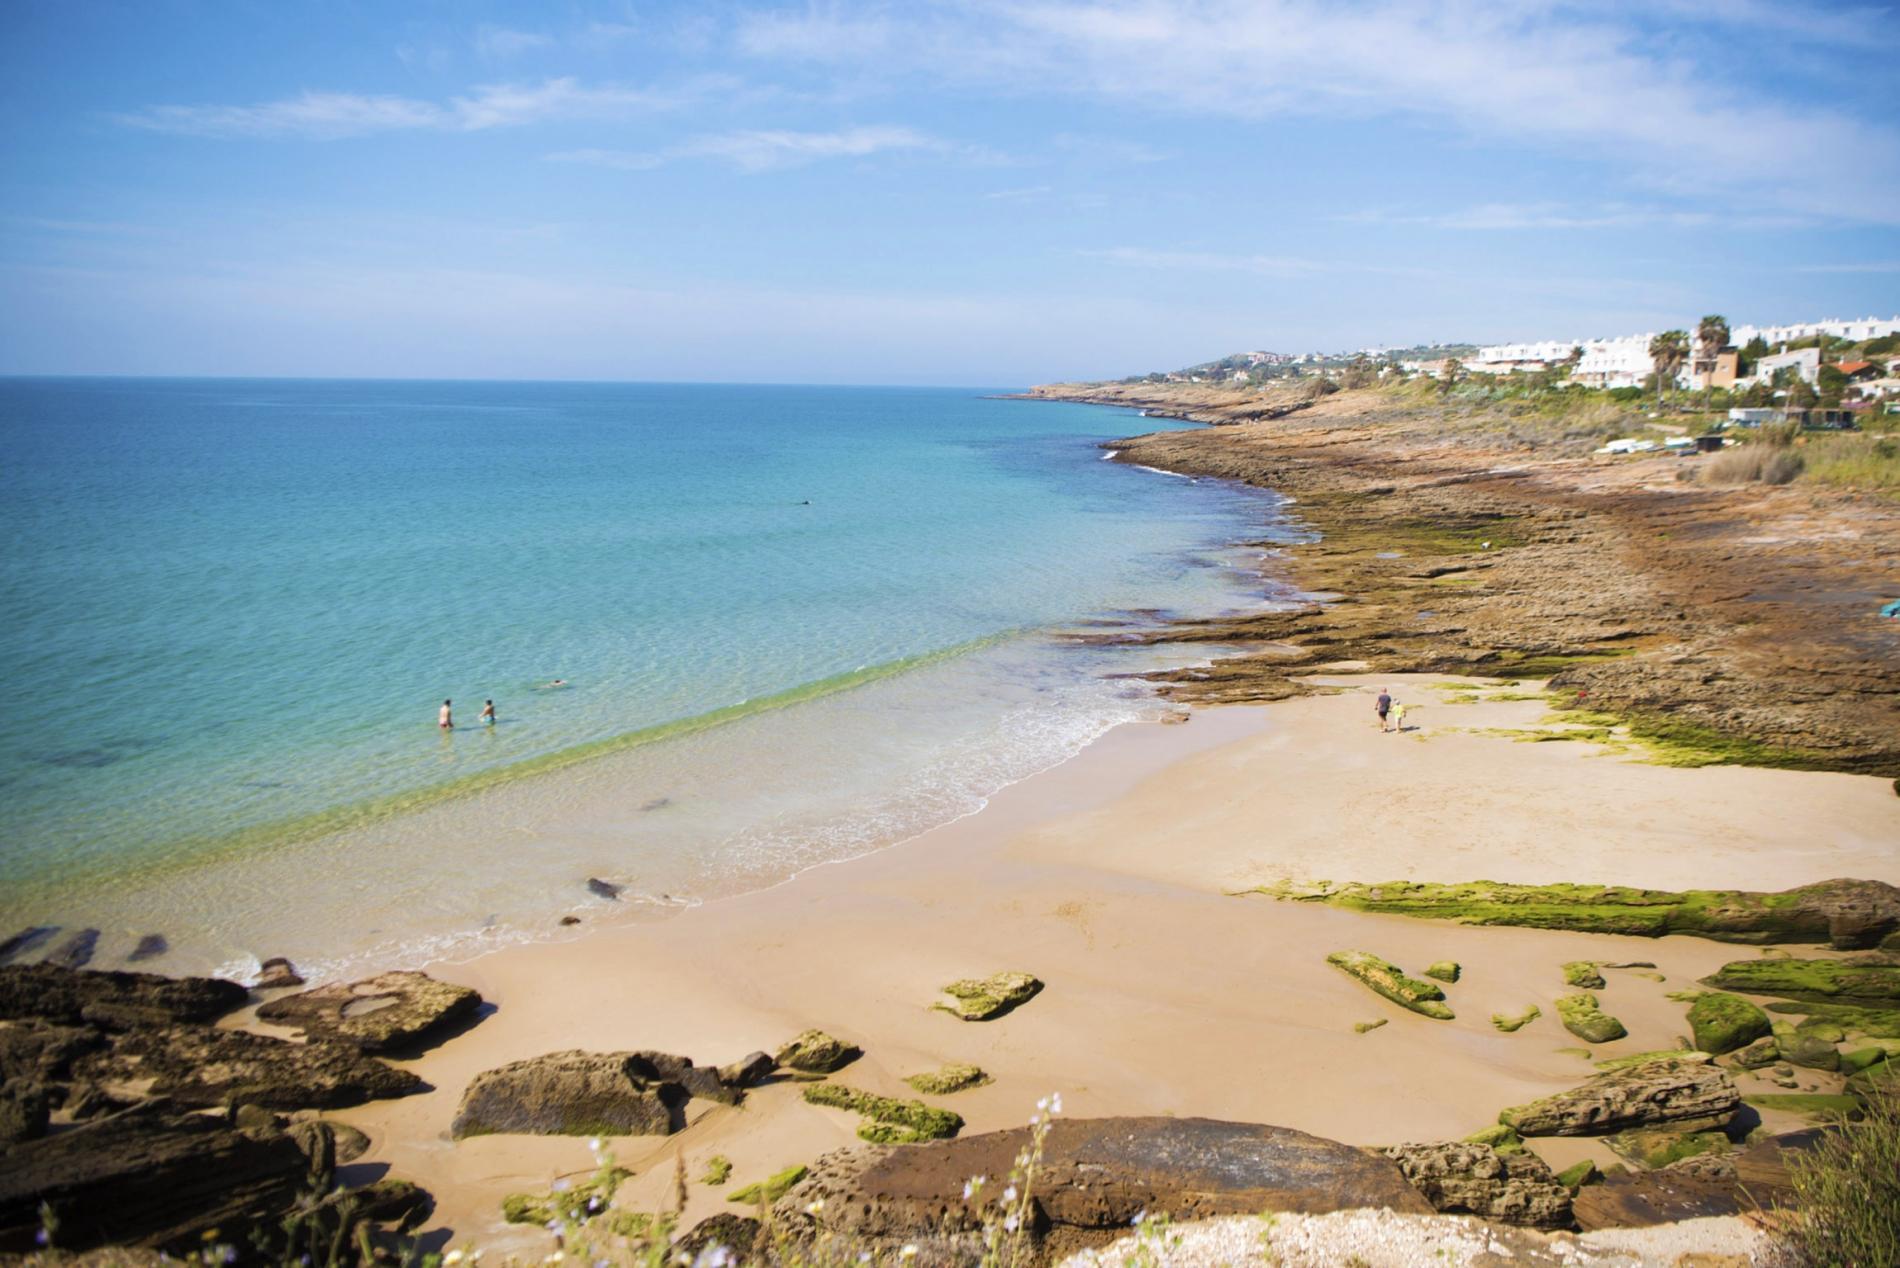 Ferienwohnung A24 - LuzBay Beach Apartment (2558091), Luz, , Algarve, Portugal, Bild 42